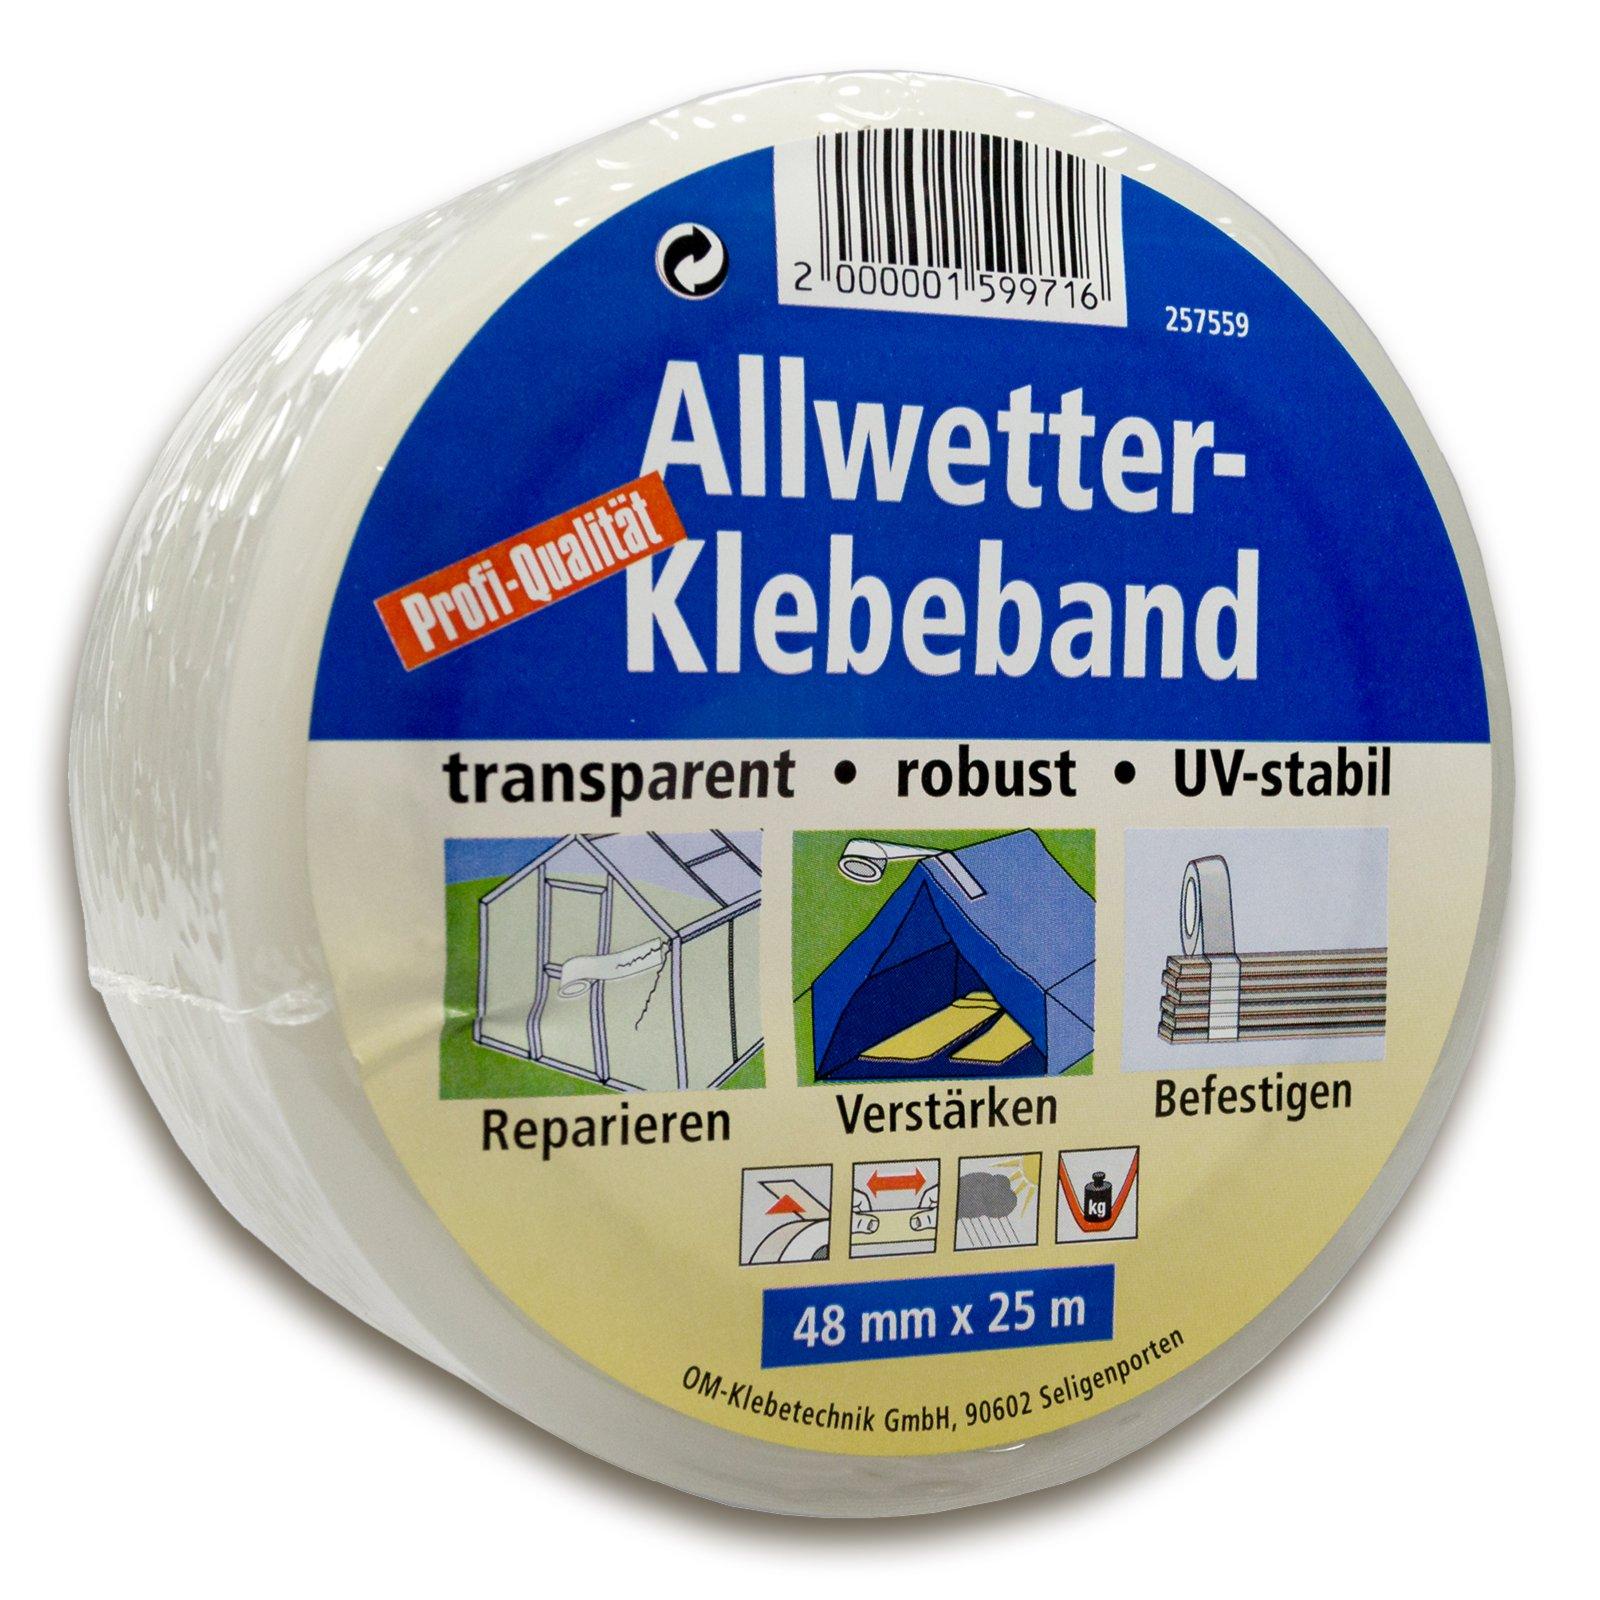 Allwetter-Klebeband - transparent - 25 Meter